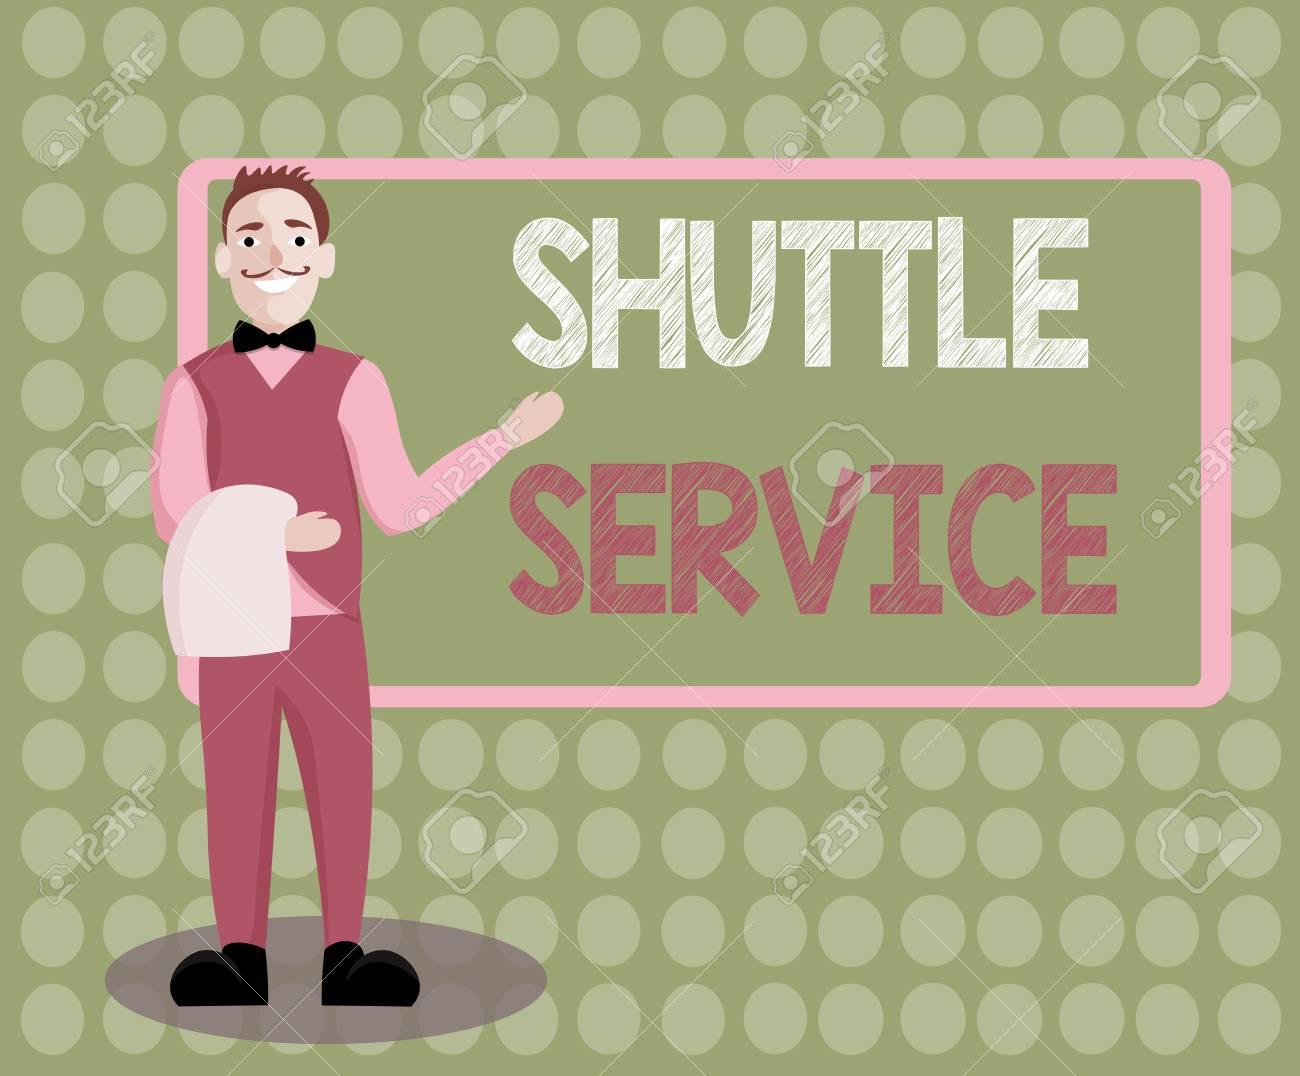 Dorothy's Shuttle Service, LLC